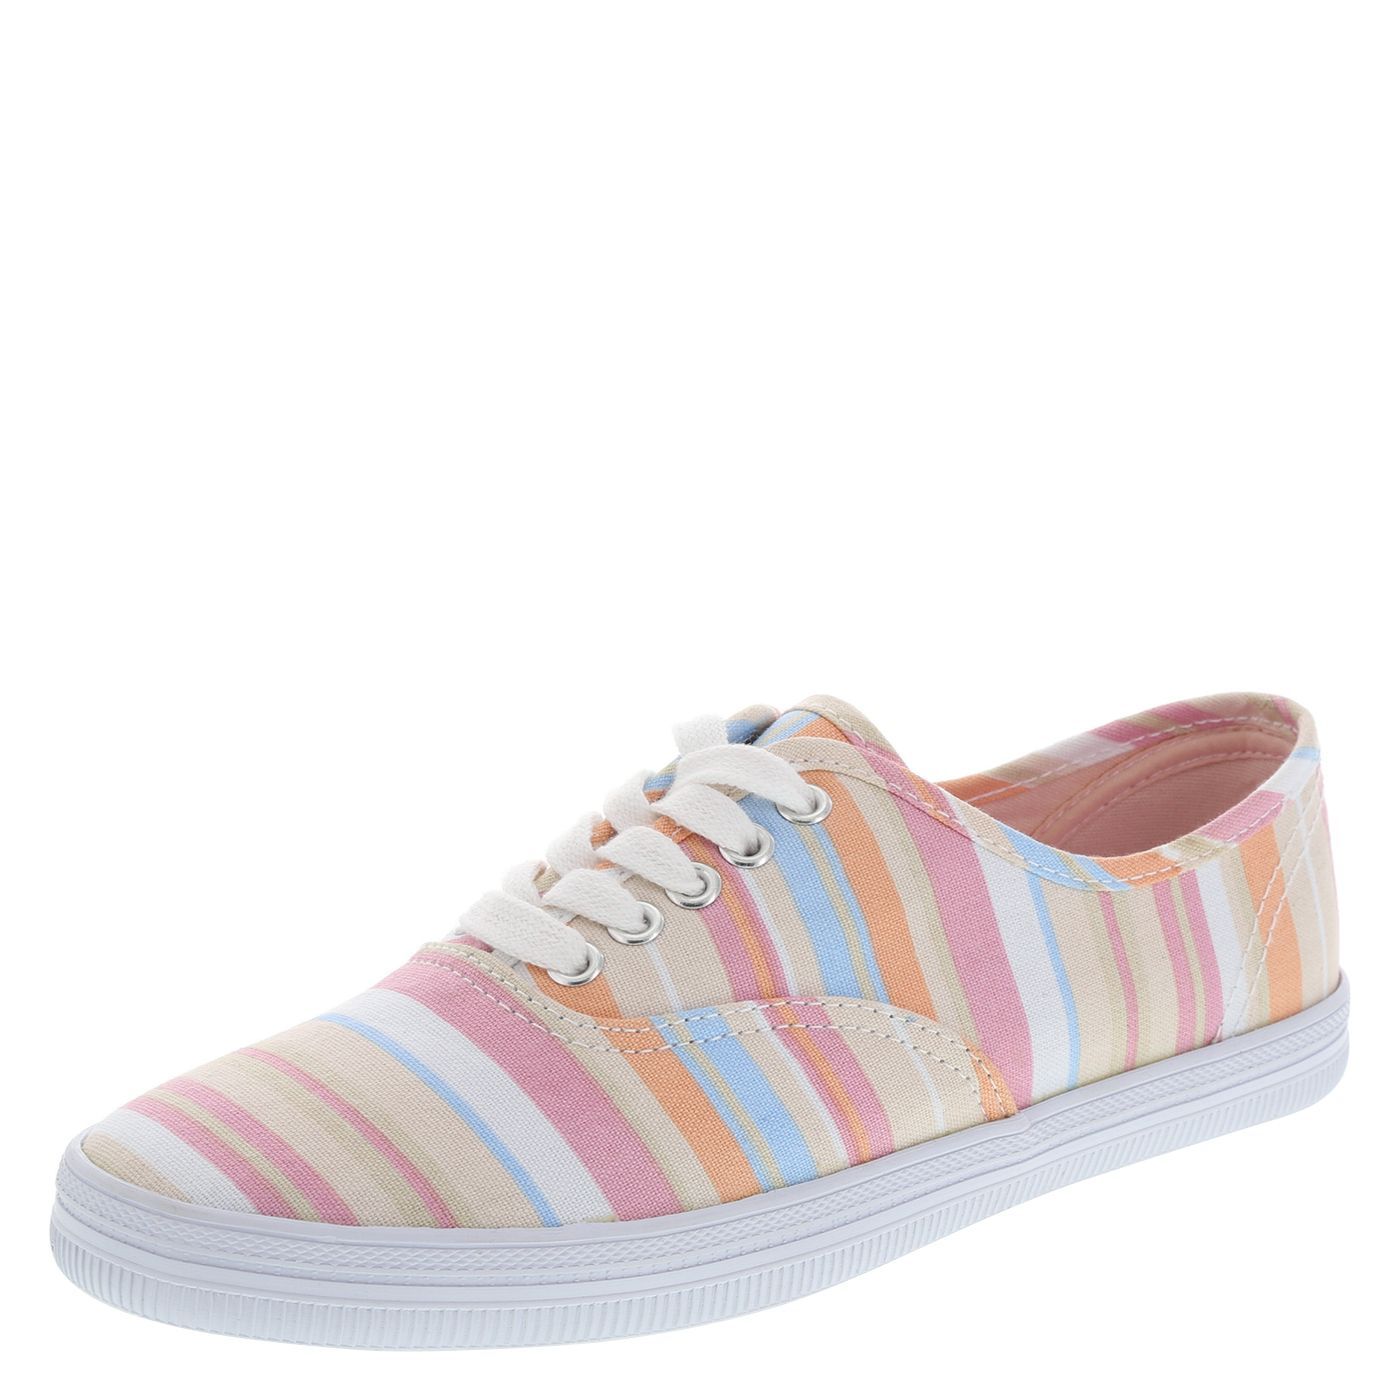 17affb23b0e8 City Sneaks - Womens Canvas Bal Sneaker